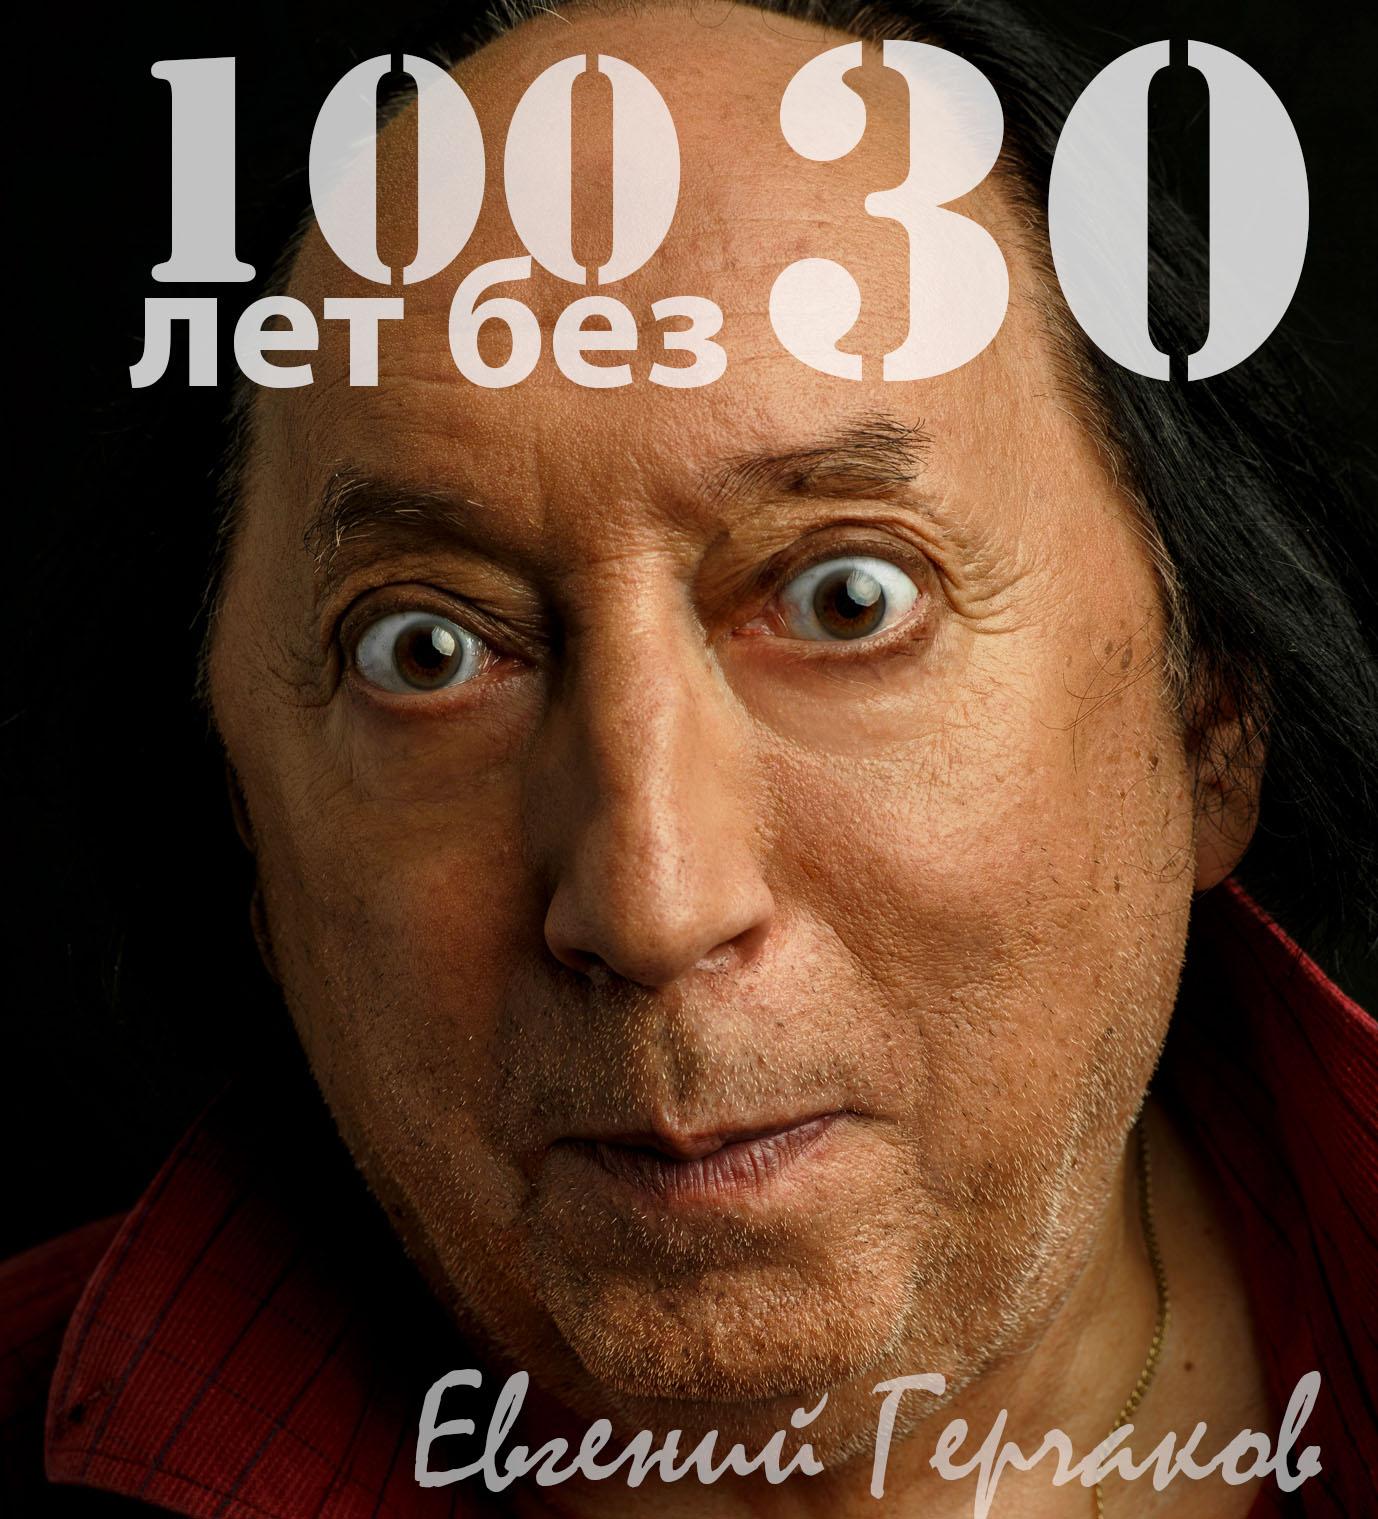 Народному артисту России Евгению Герчакову без 30 … СТО